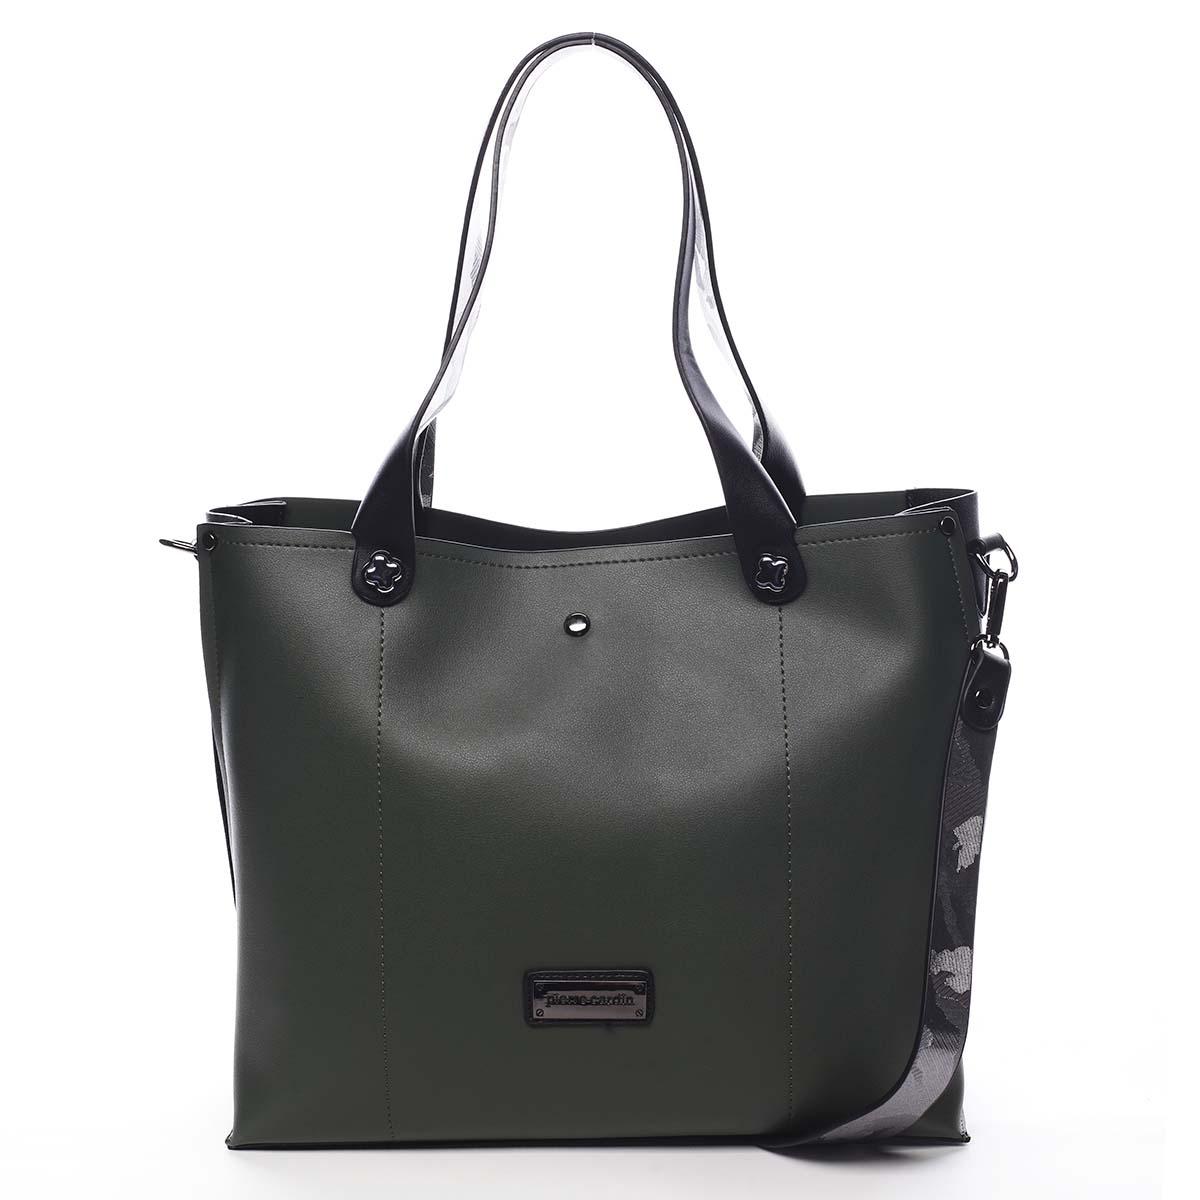 Dámska kabelka cez plece zelená - Pierre Cardin Ellie